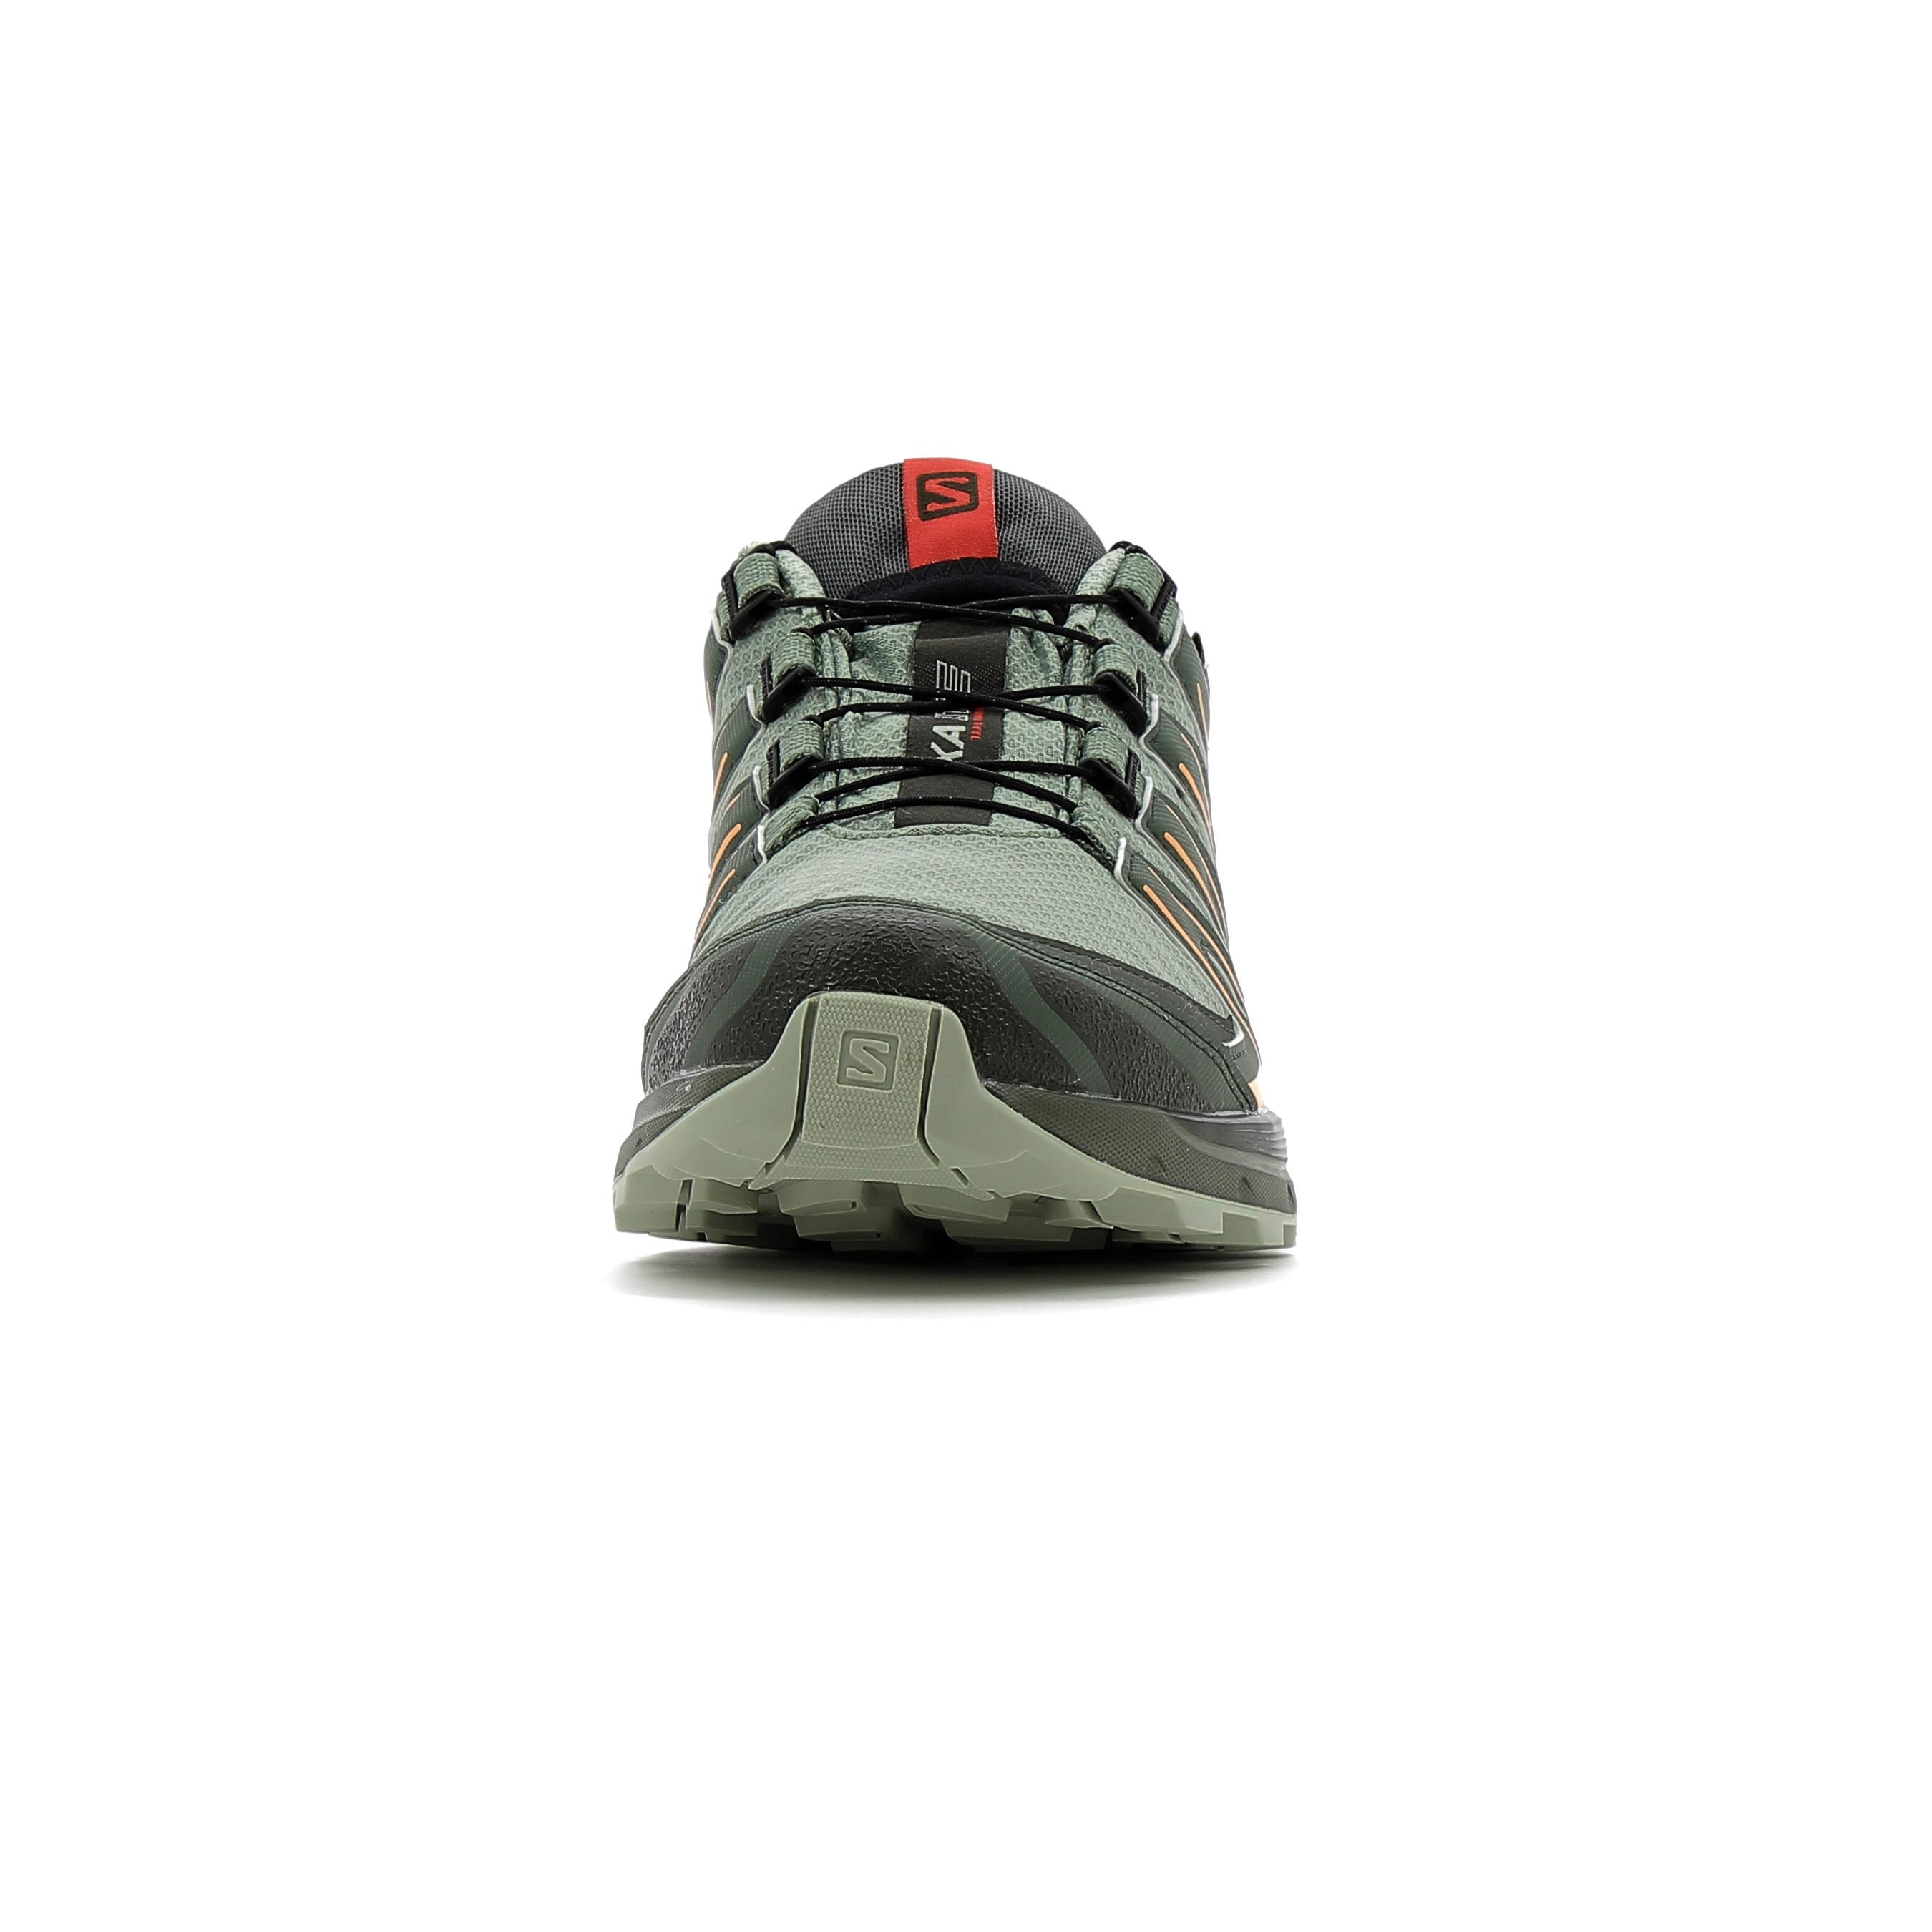 Salomon Lite Chaussures trail rando GTX XA de tQxhdsCr